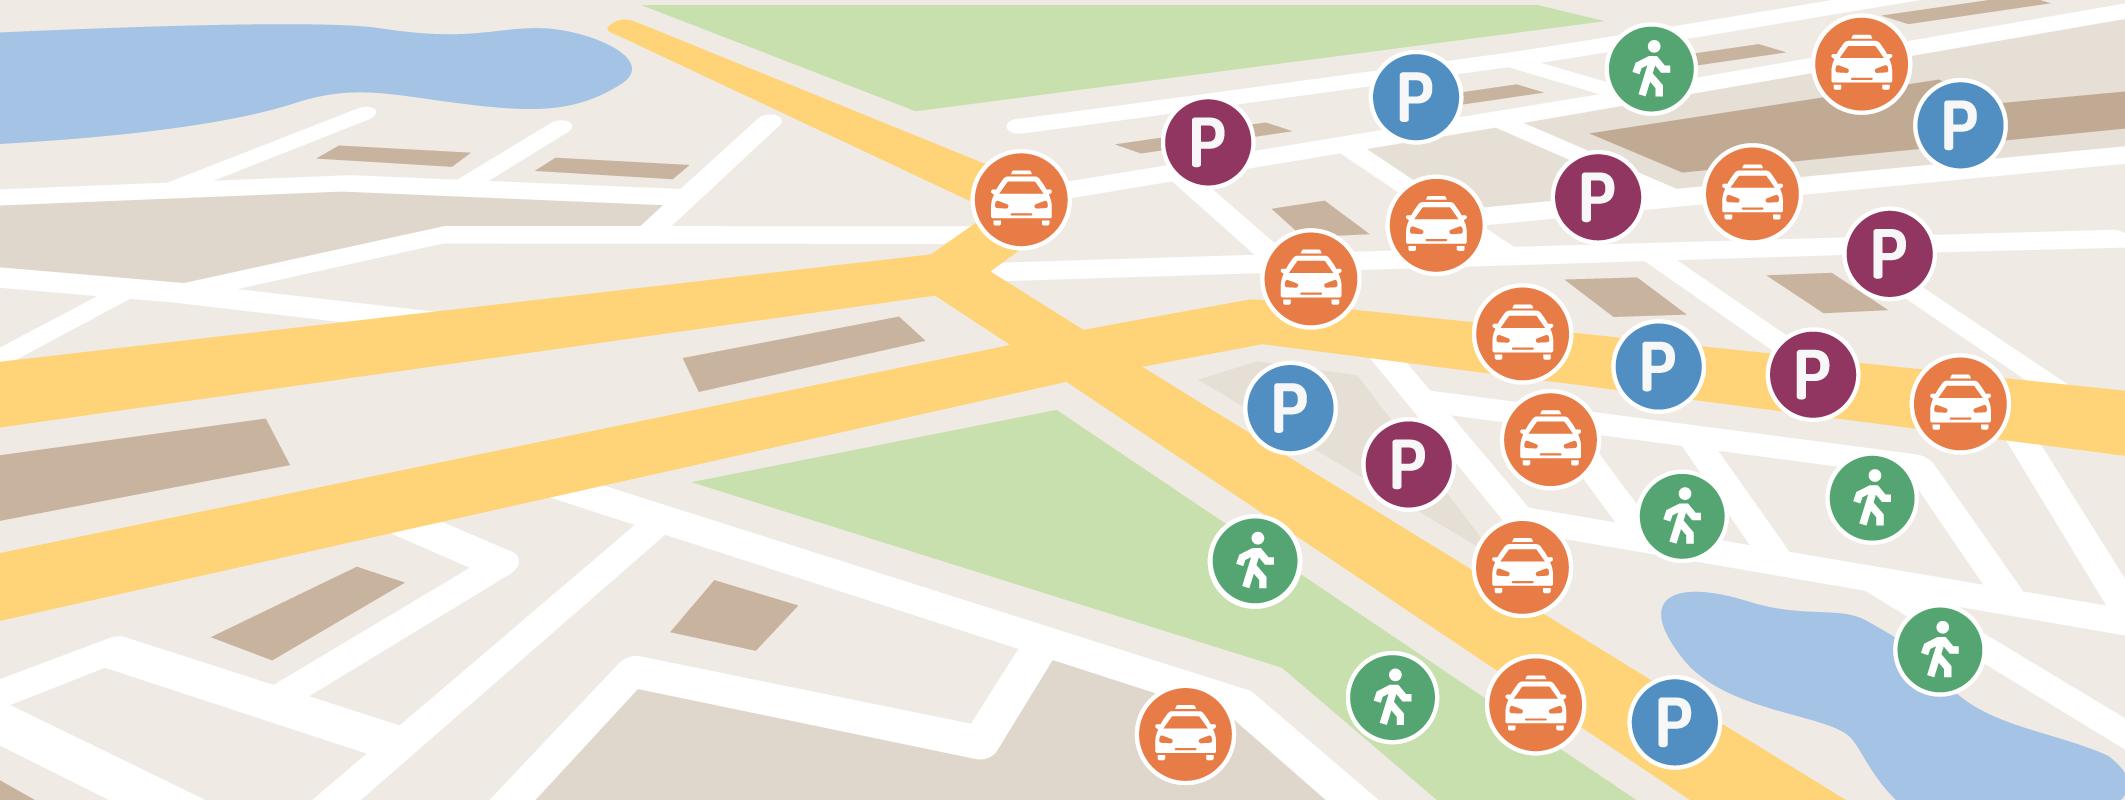 PCN Hotspot London Private Hire Drivers